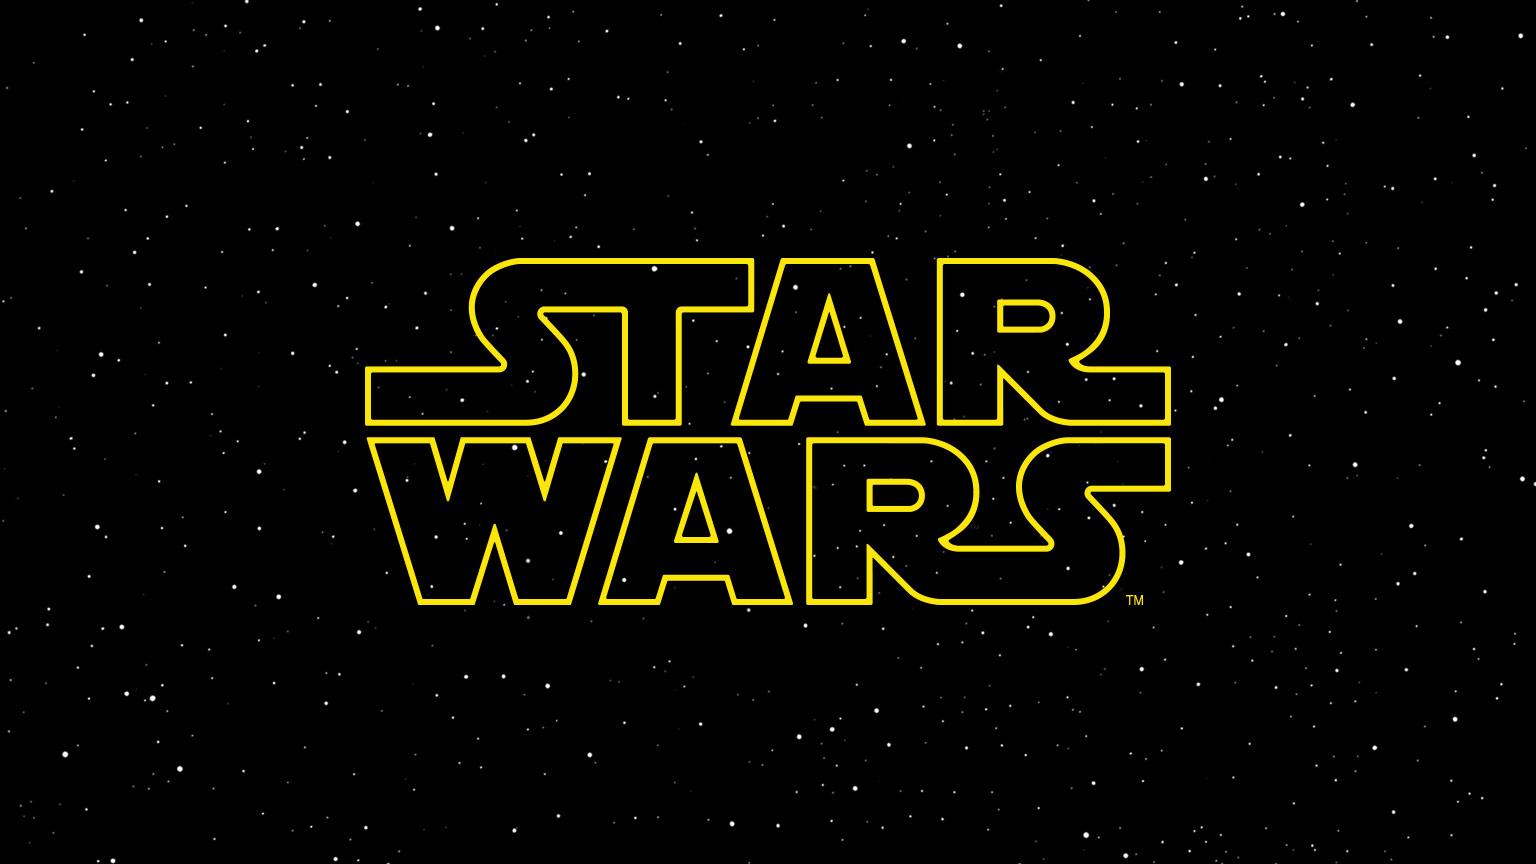 Star-wars-logo-new-tall.jpg